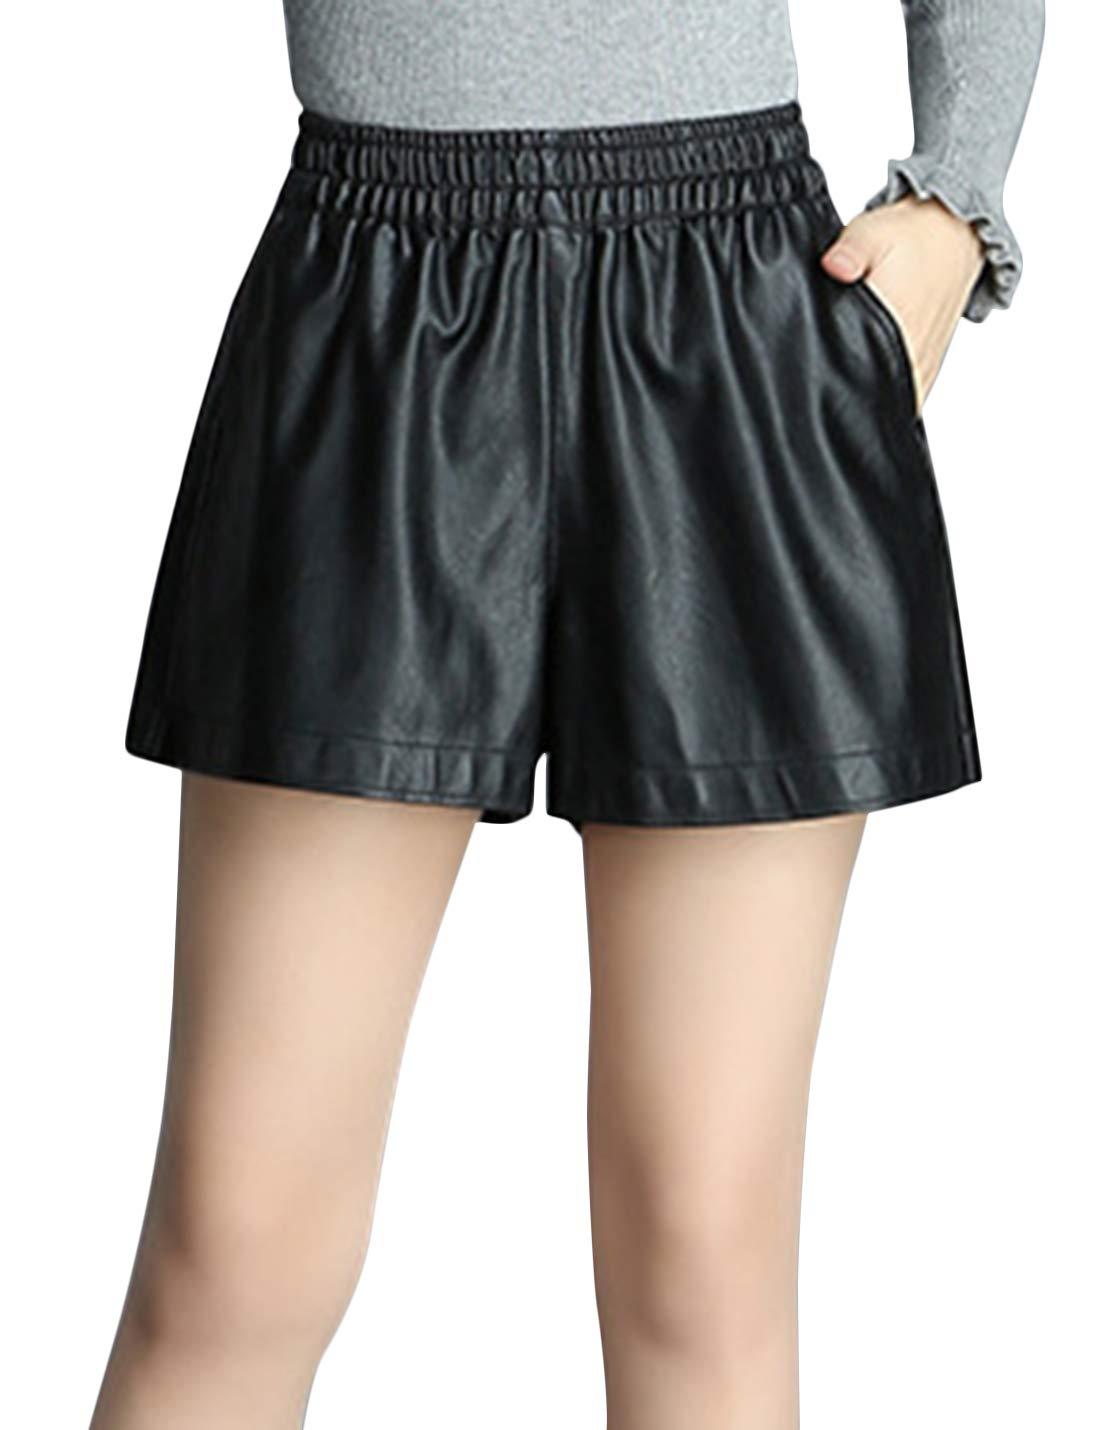 Tanming Womens Casual Elastic Waist PU Leather Shorts Wide Leg Shorts with Pockets (Black, Medium)